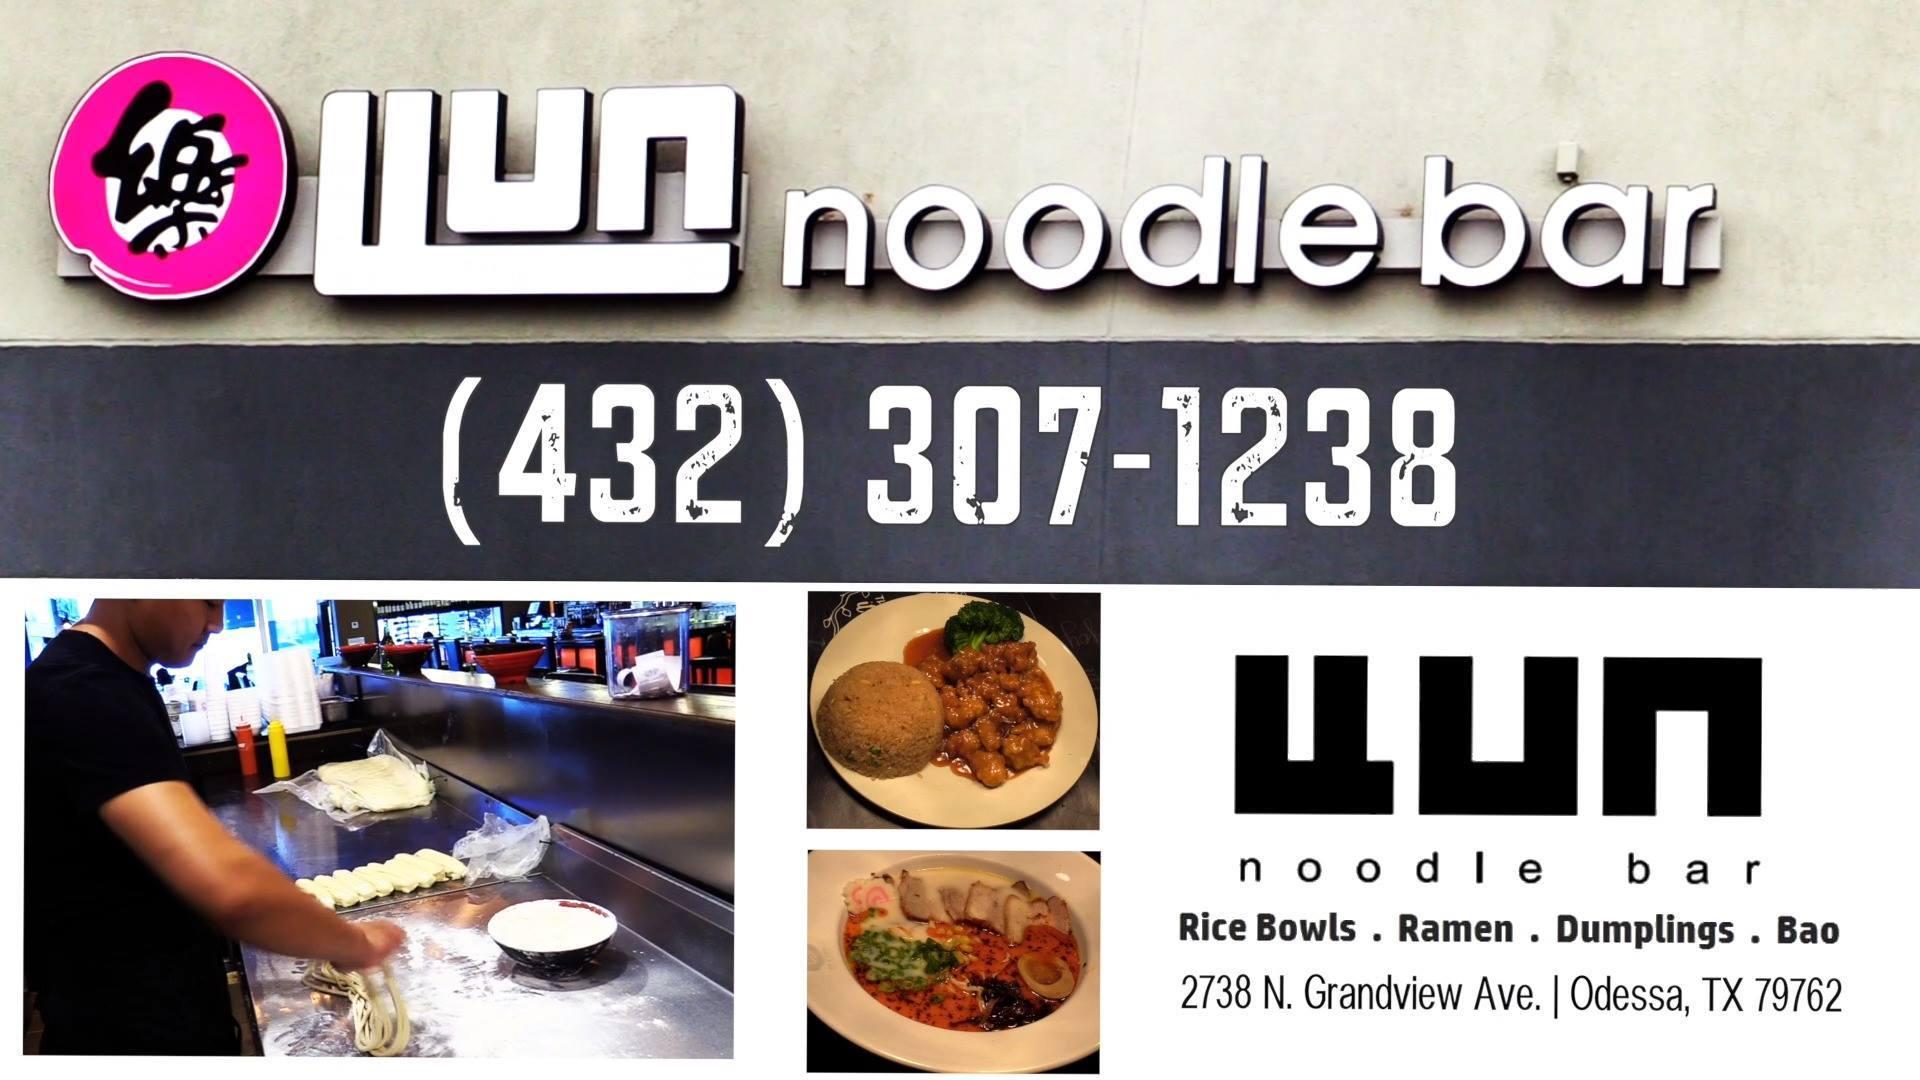 Fun Noodle Bar TV Ad